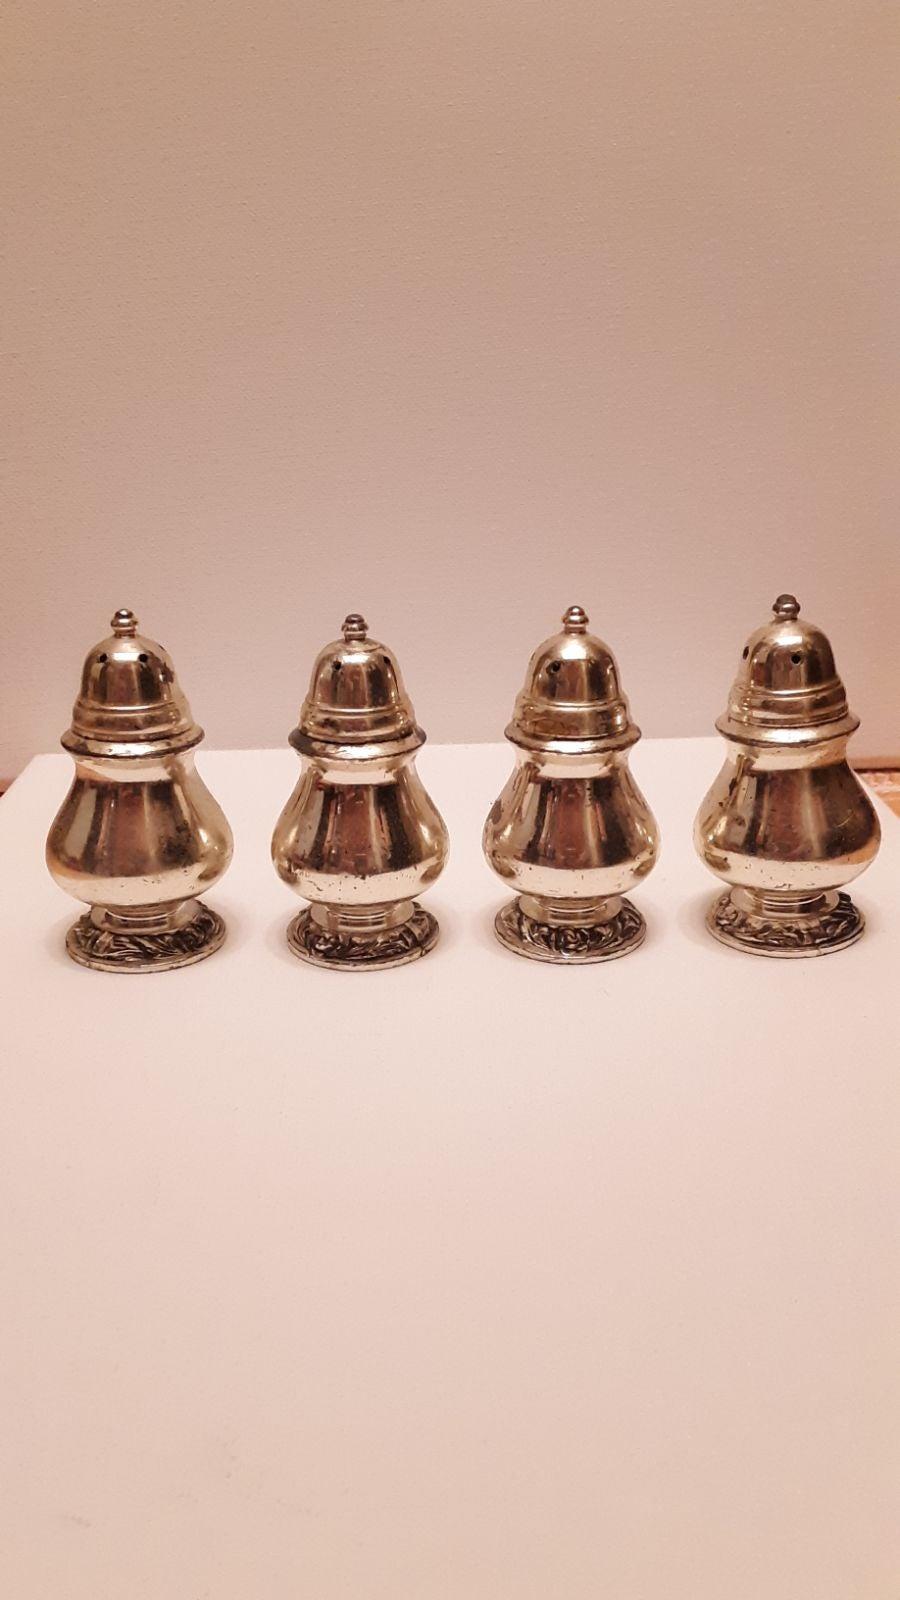 Set of 4 oneida salt and pepper shakers